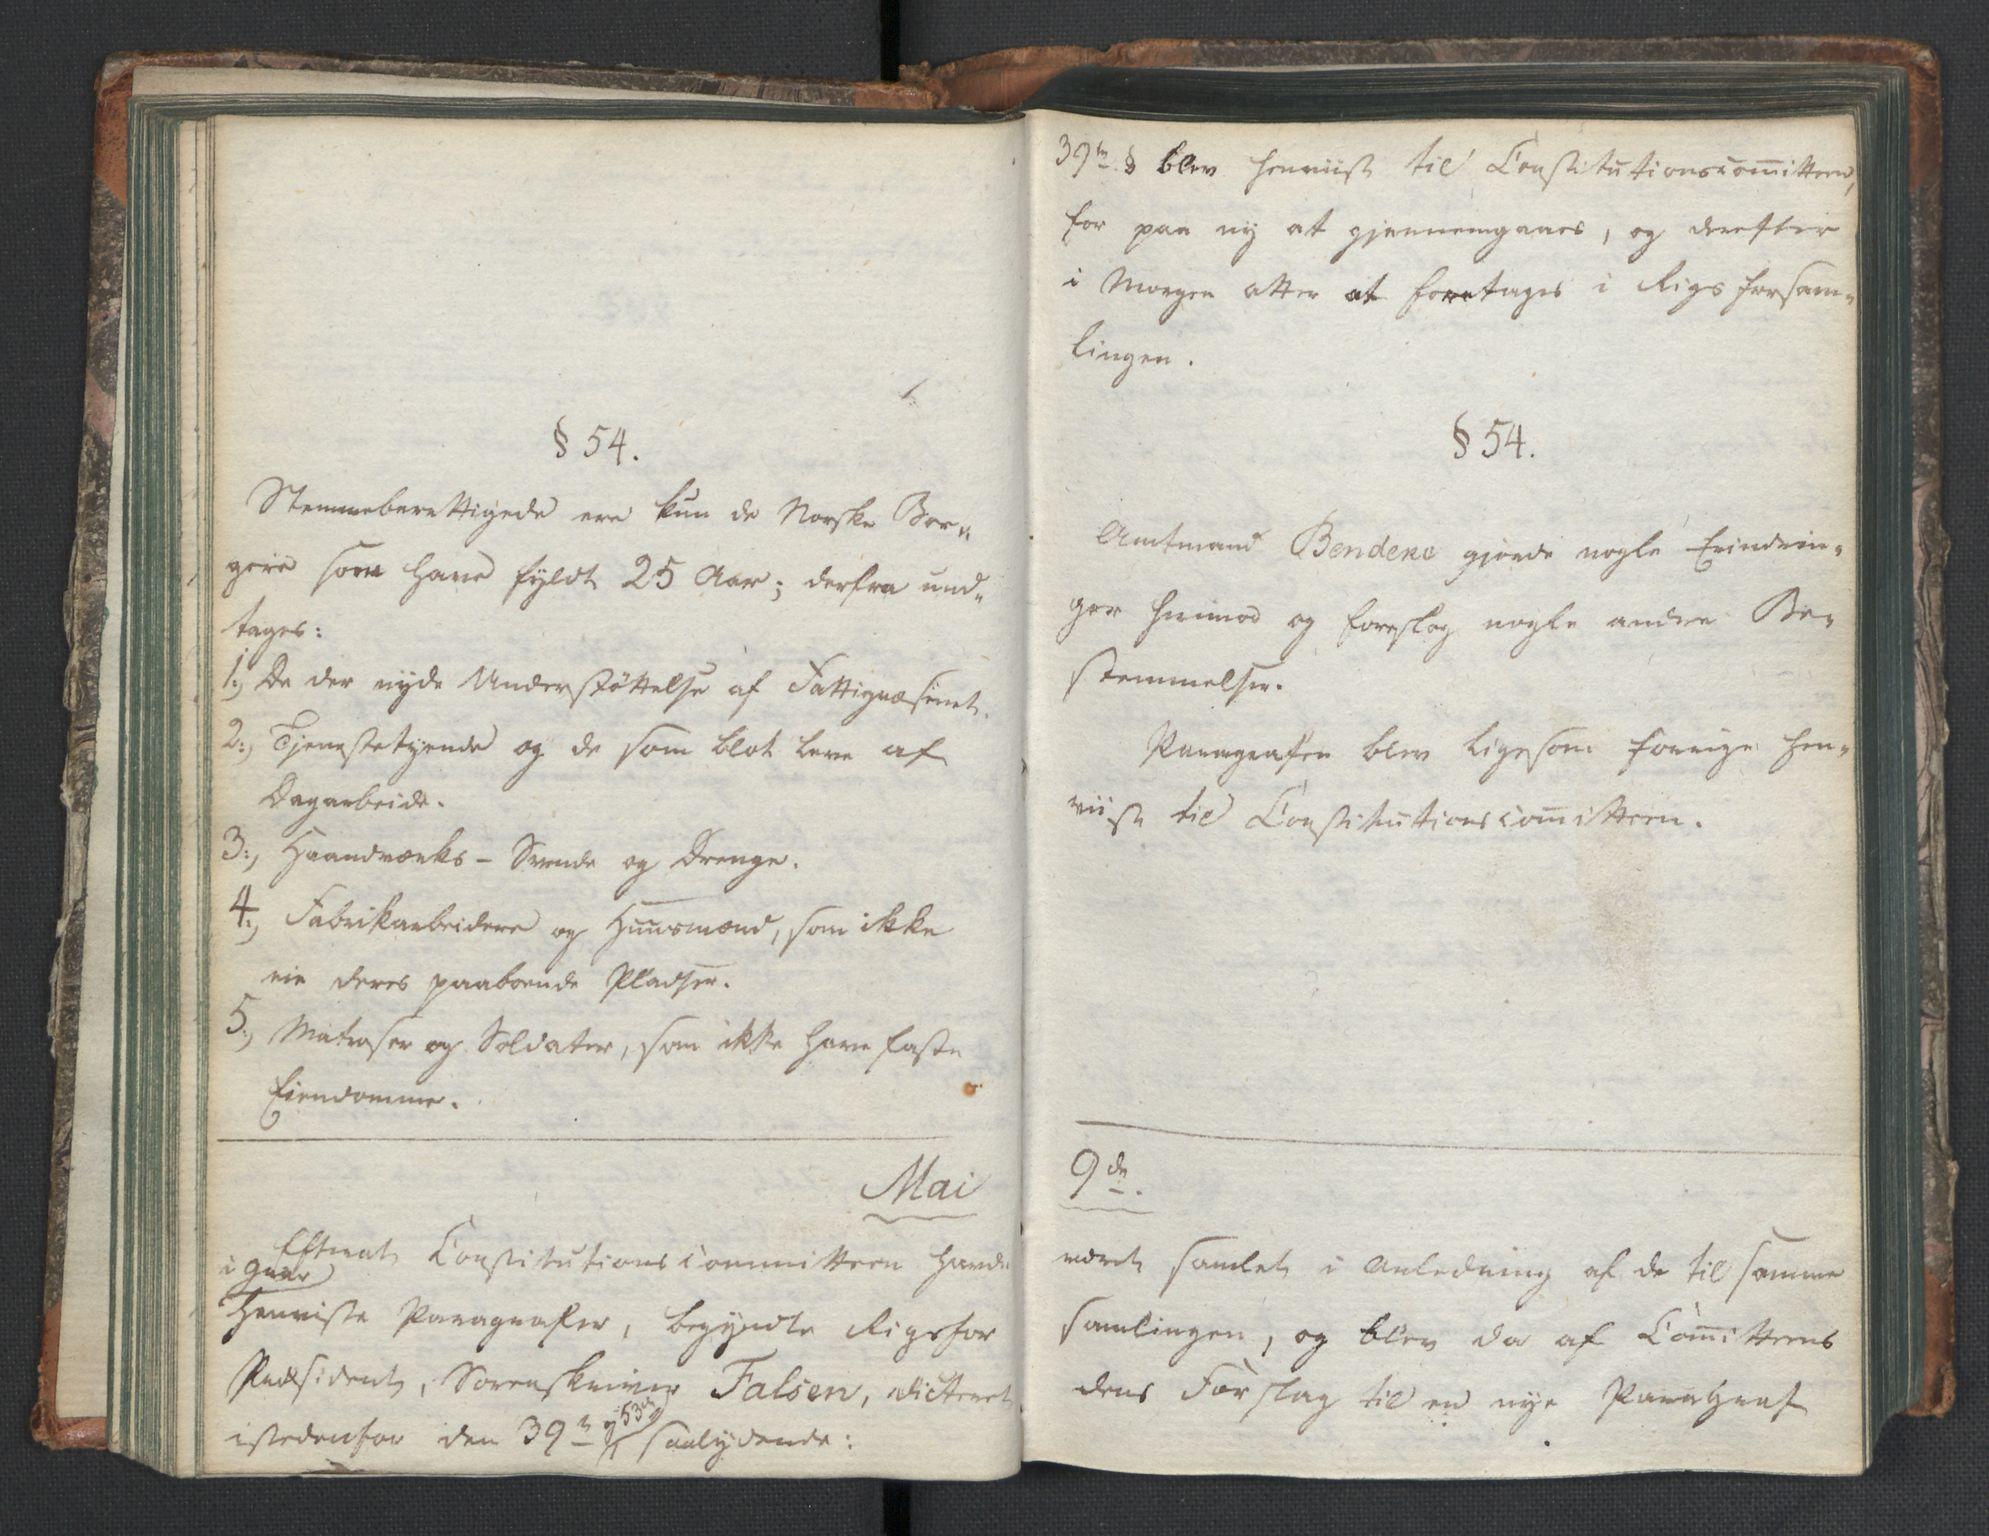 RA, Manuskriptsamlingen, H/L0021: Byfogd Gregers Winther Wulfbergs dagbok under Riksforsamlingen på Eidsvoll, 1814, s. upaginert